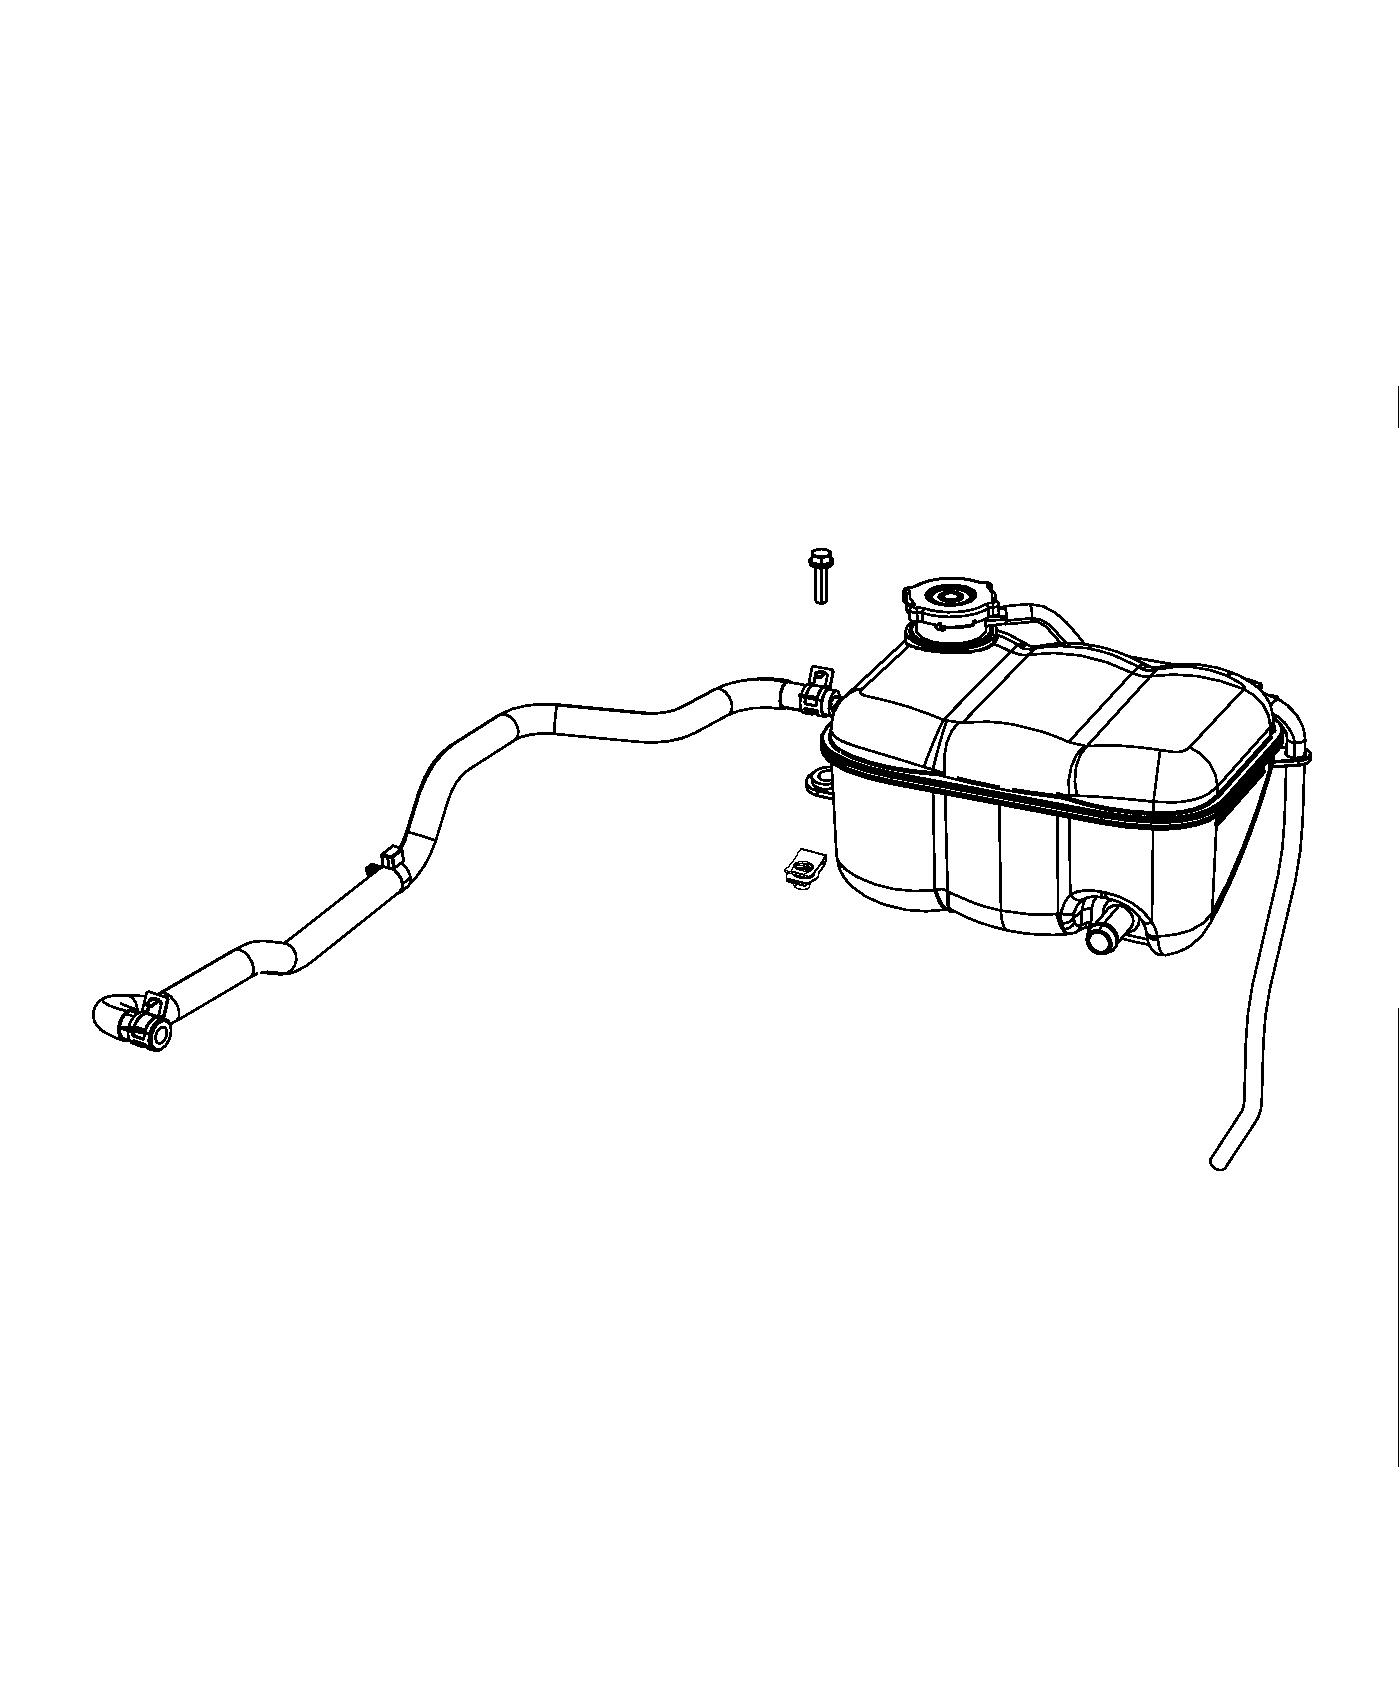 Dodge Viper Bottle Pressurized Coolant Includes Cap